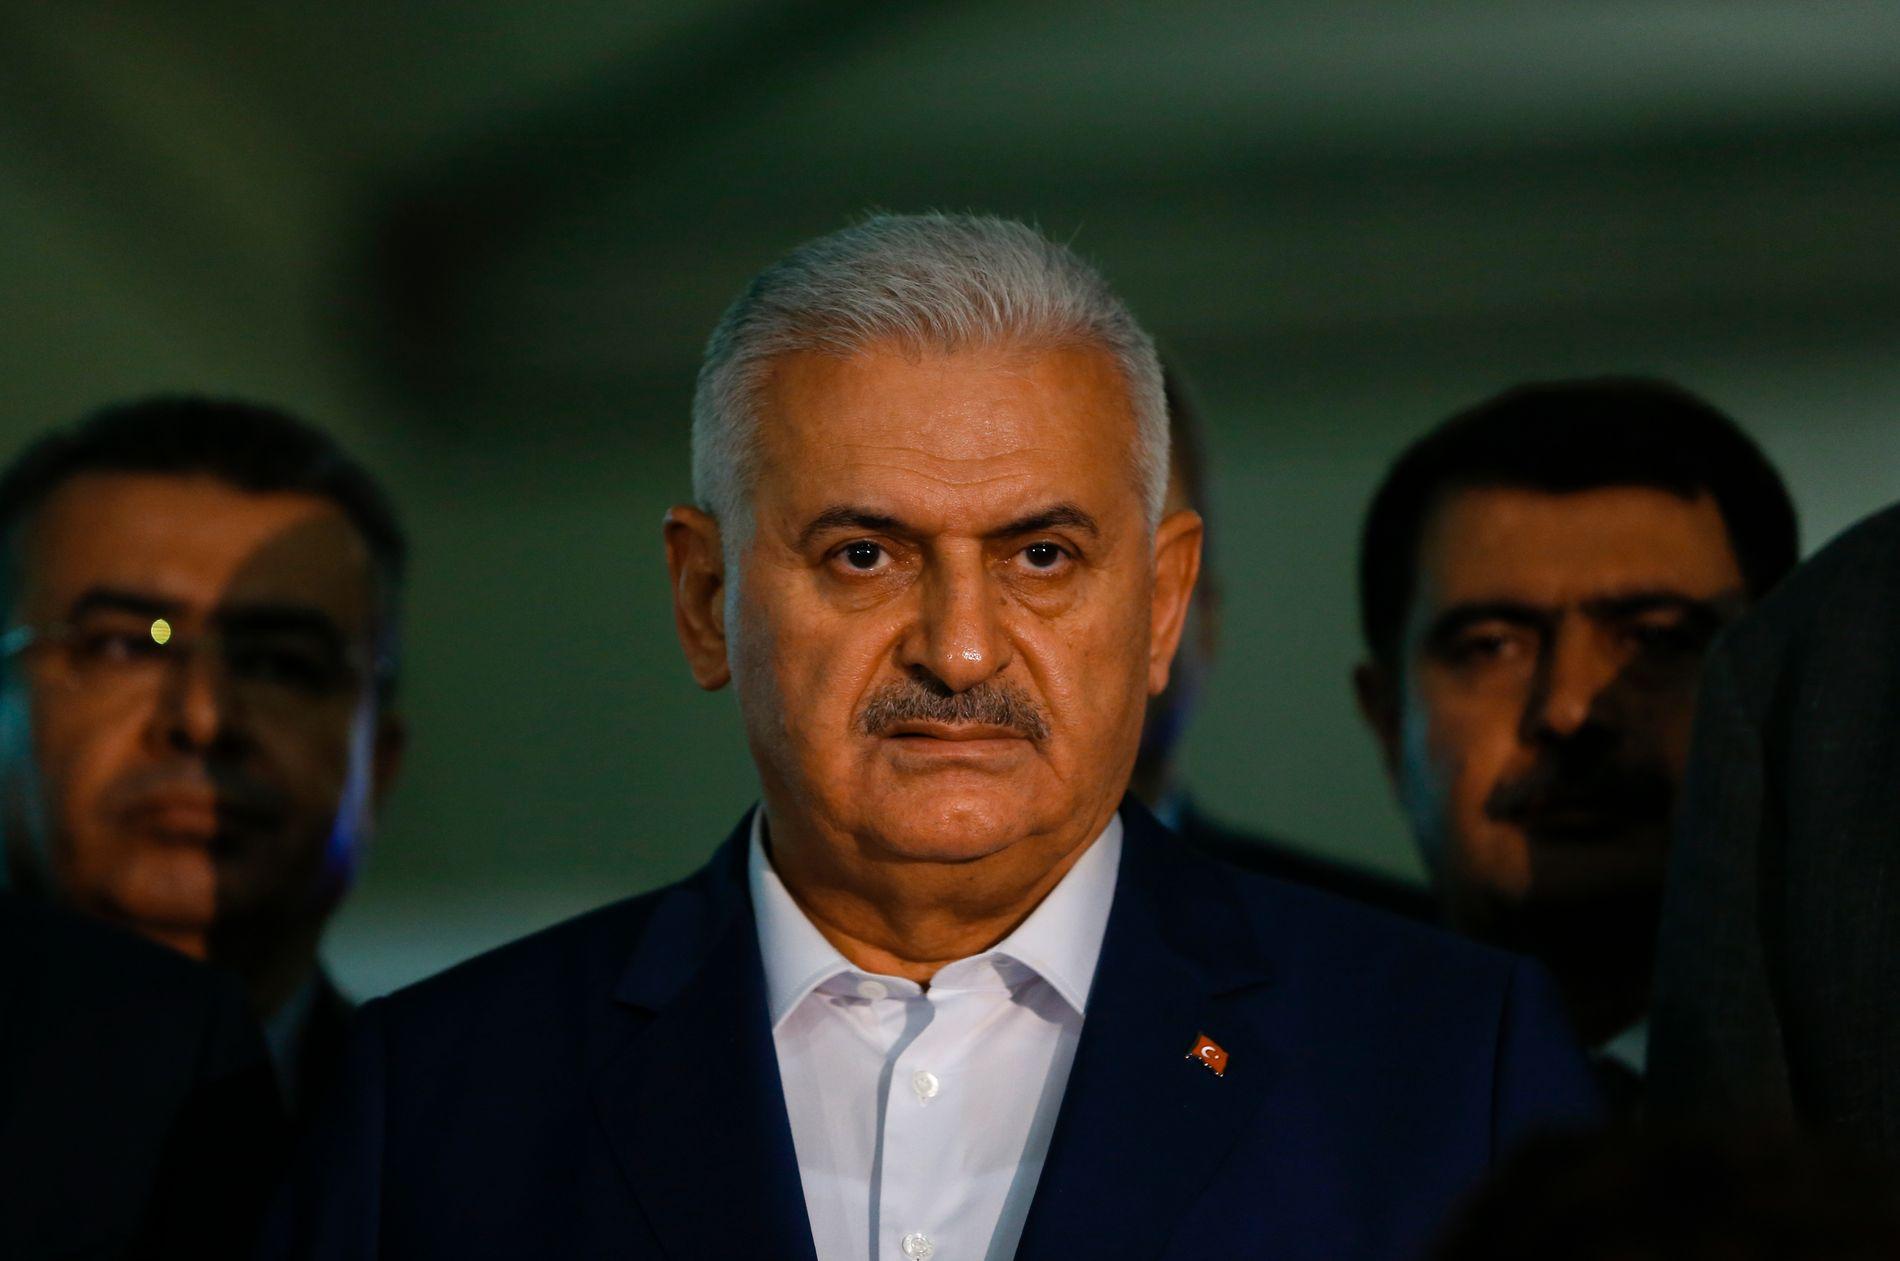 MANGE DREPT: Tyrkias statsminister Binali Yildirim på en pressekonferanse ved flyplassen i natt.